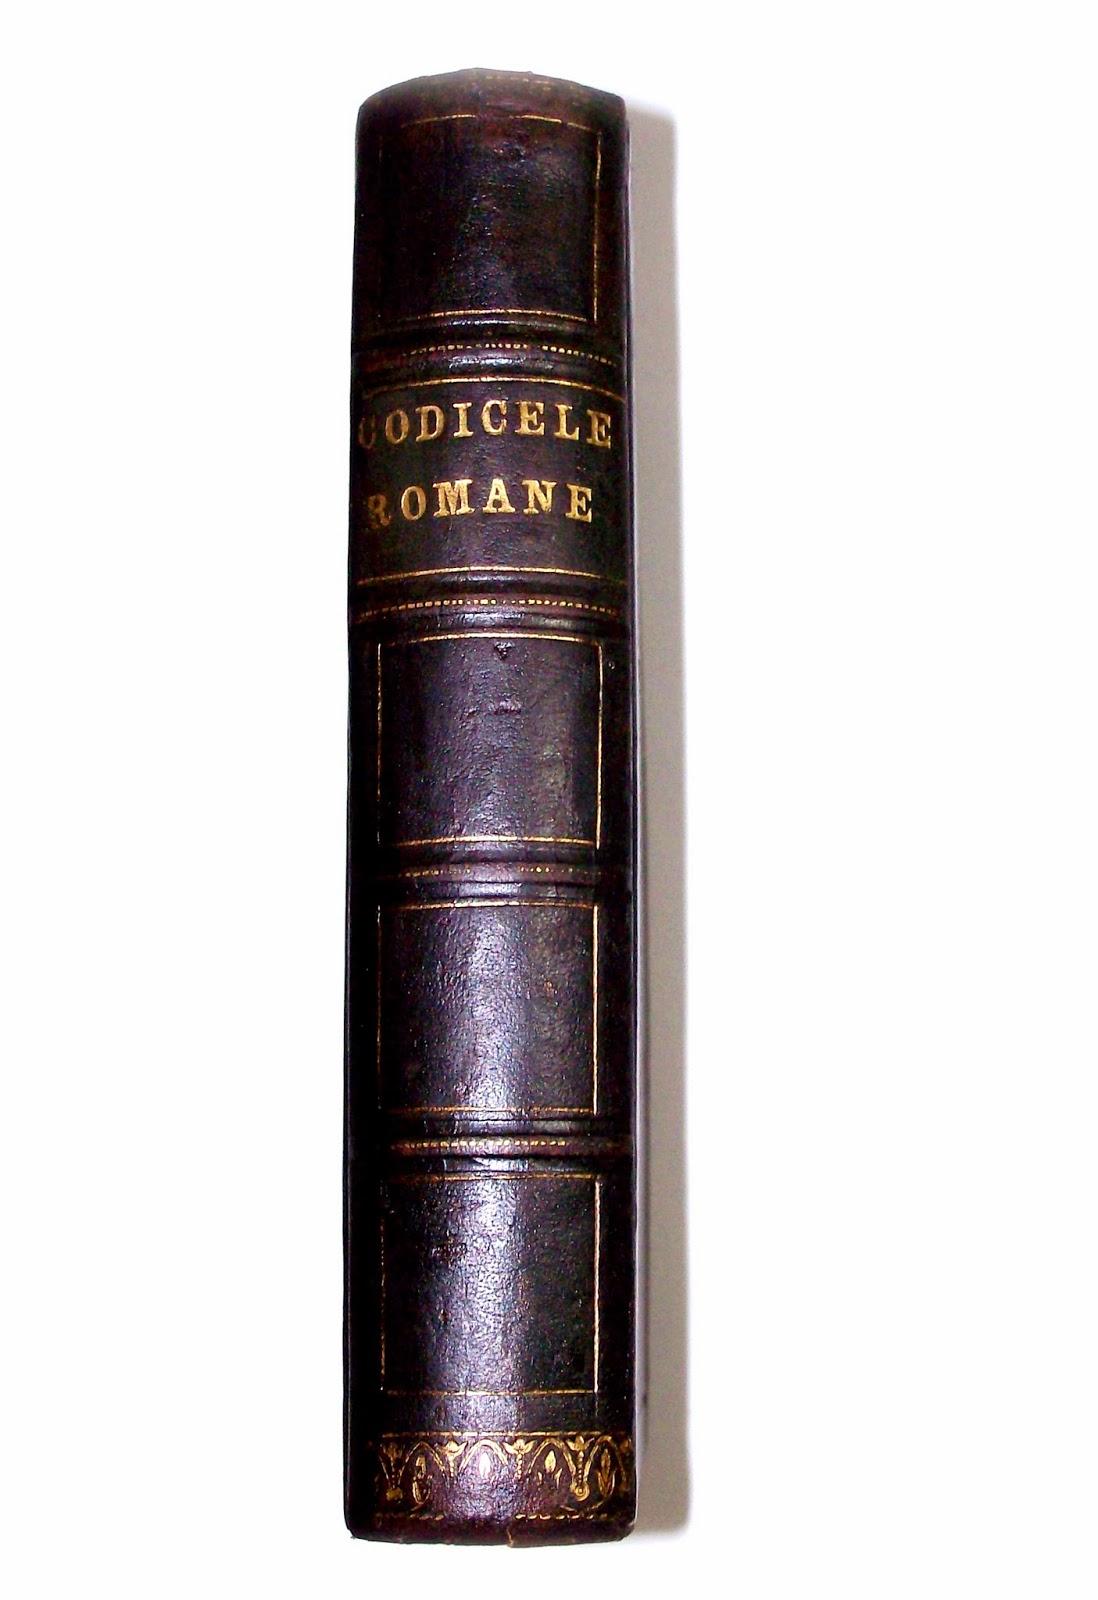 Arta c r ii restaurare codicele rom ne - Le 12 tavole romane ...